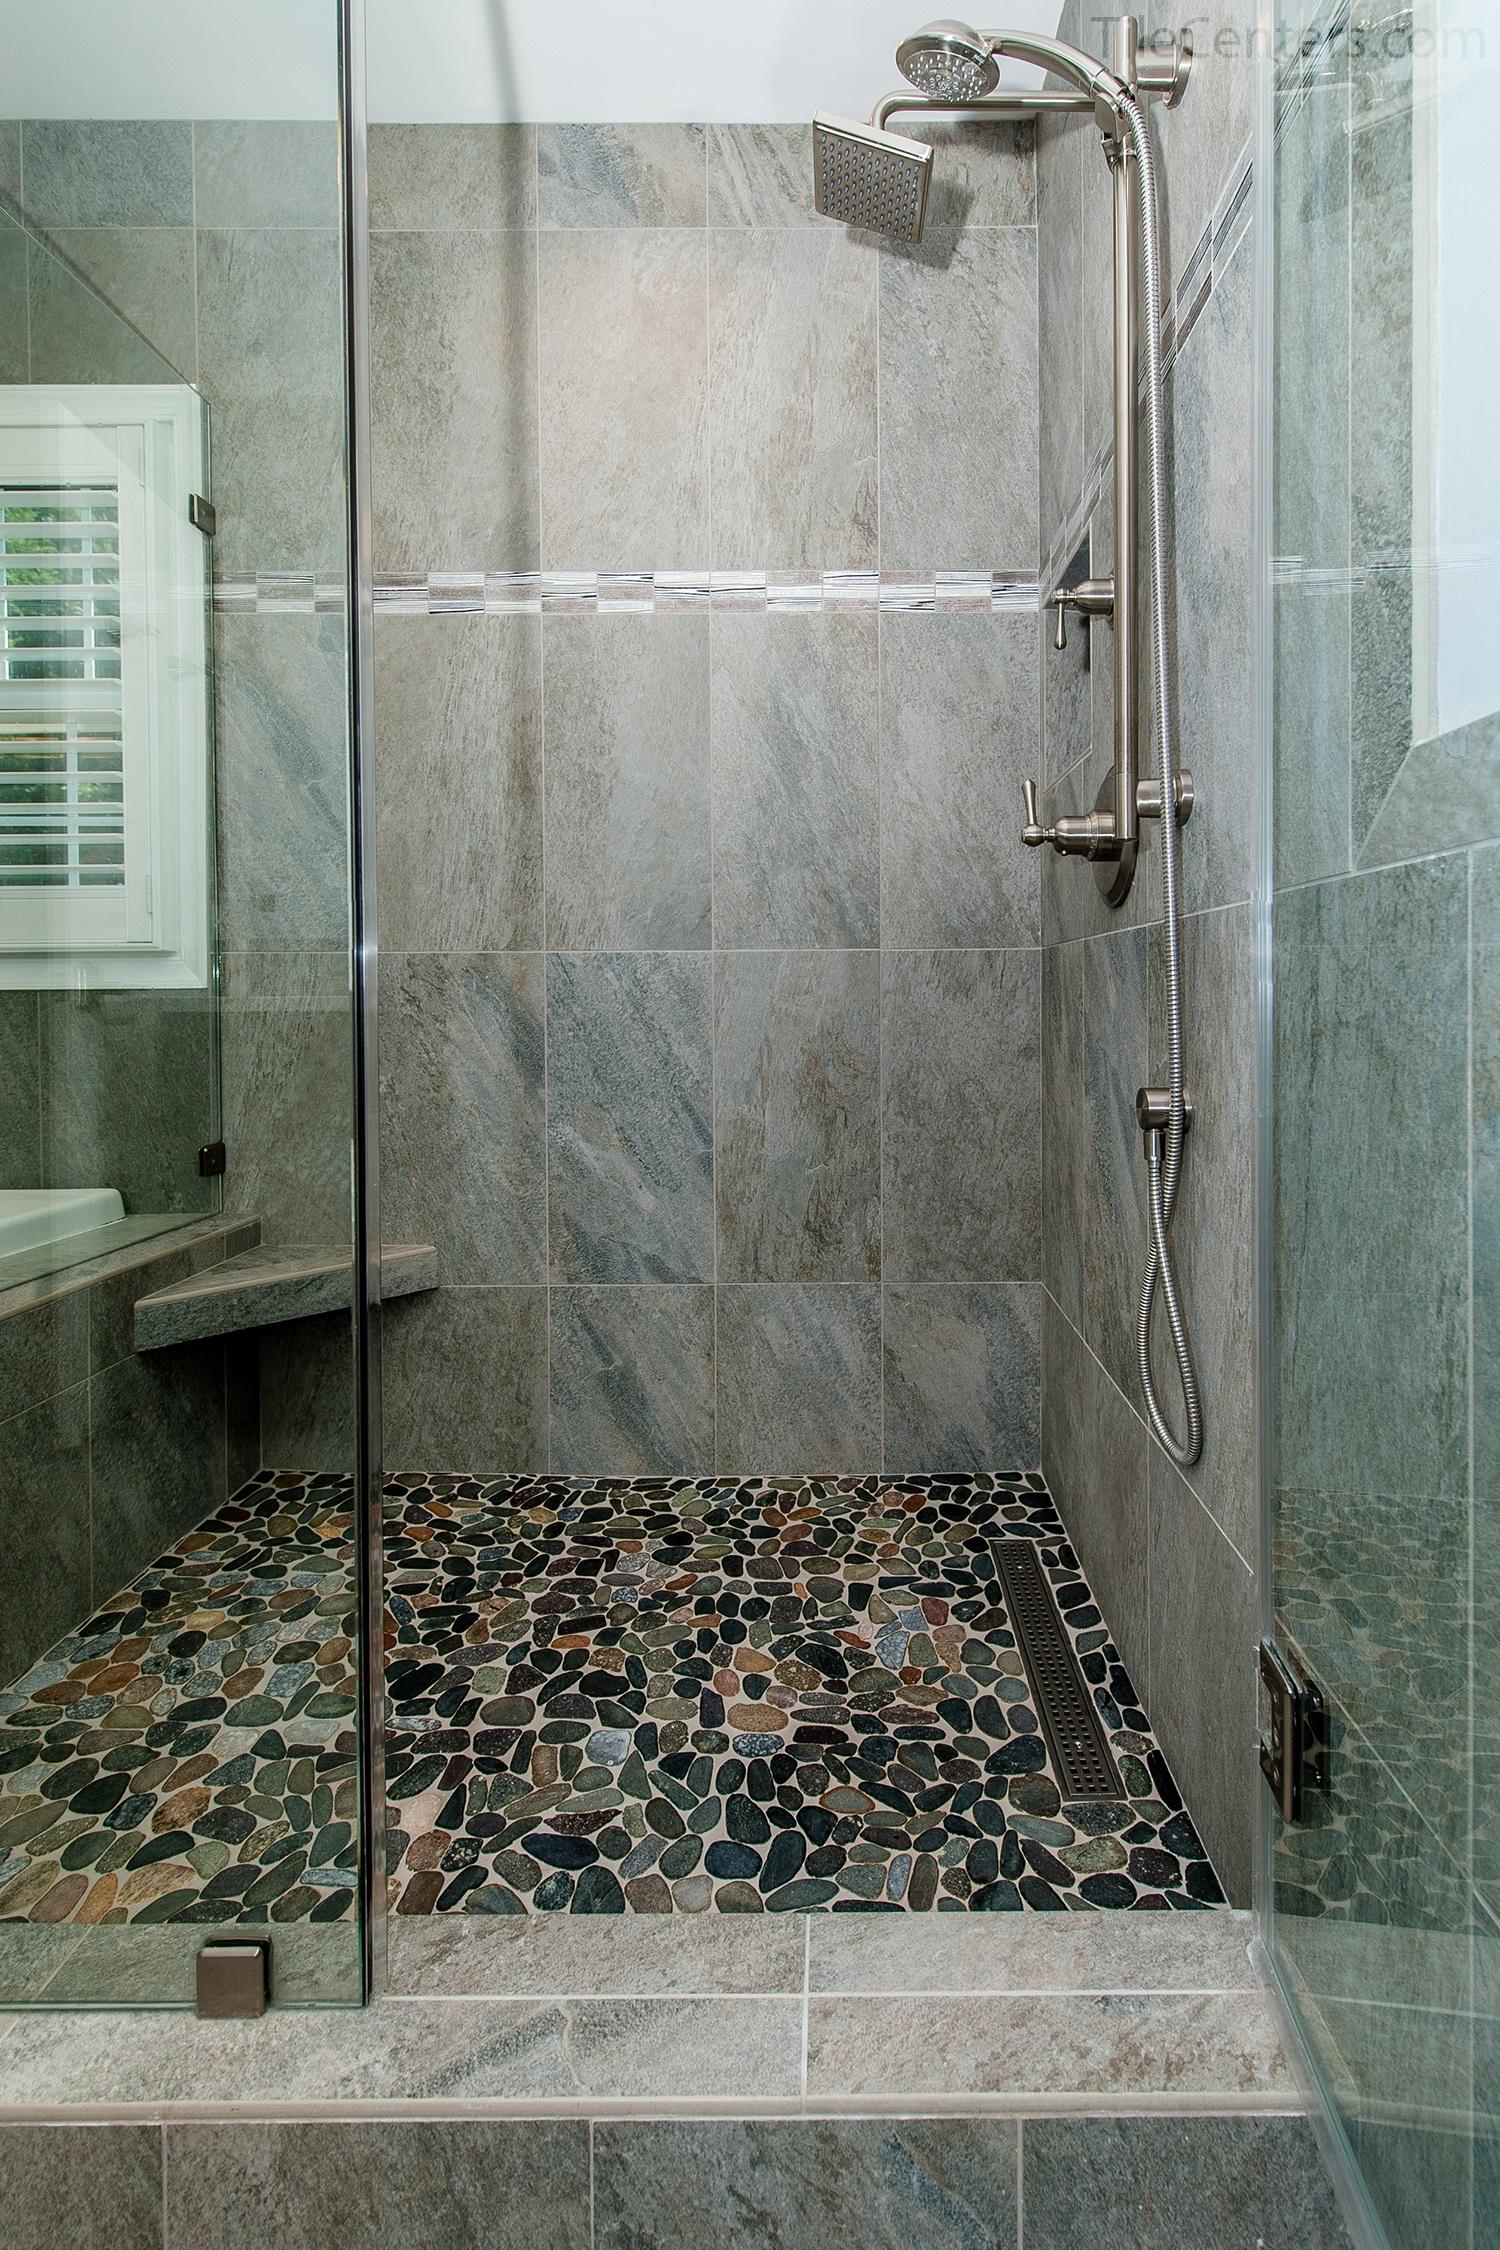 Bathroom Remodel Downland Terrace Olney Md 20832